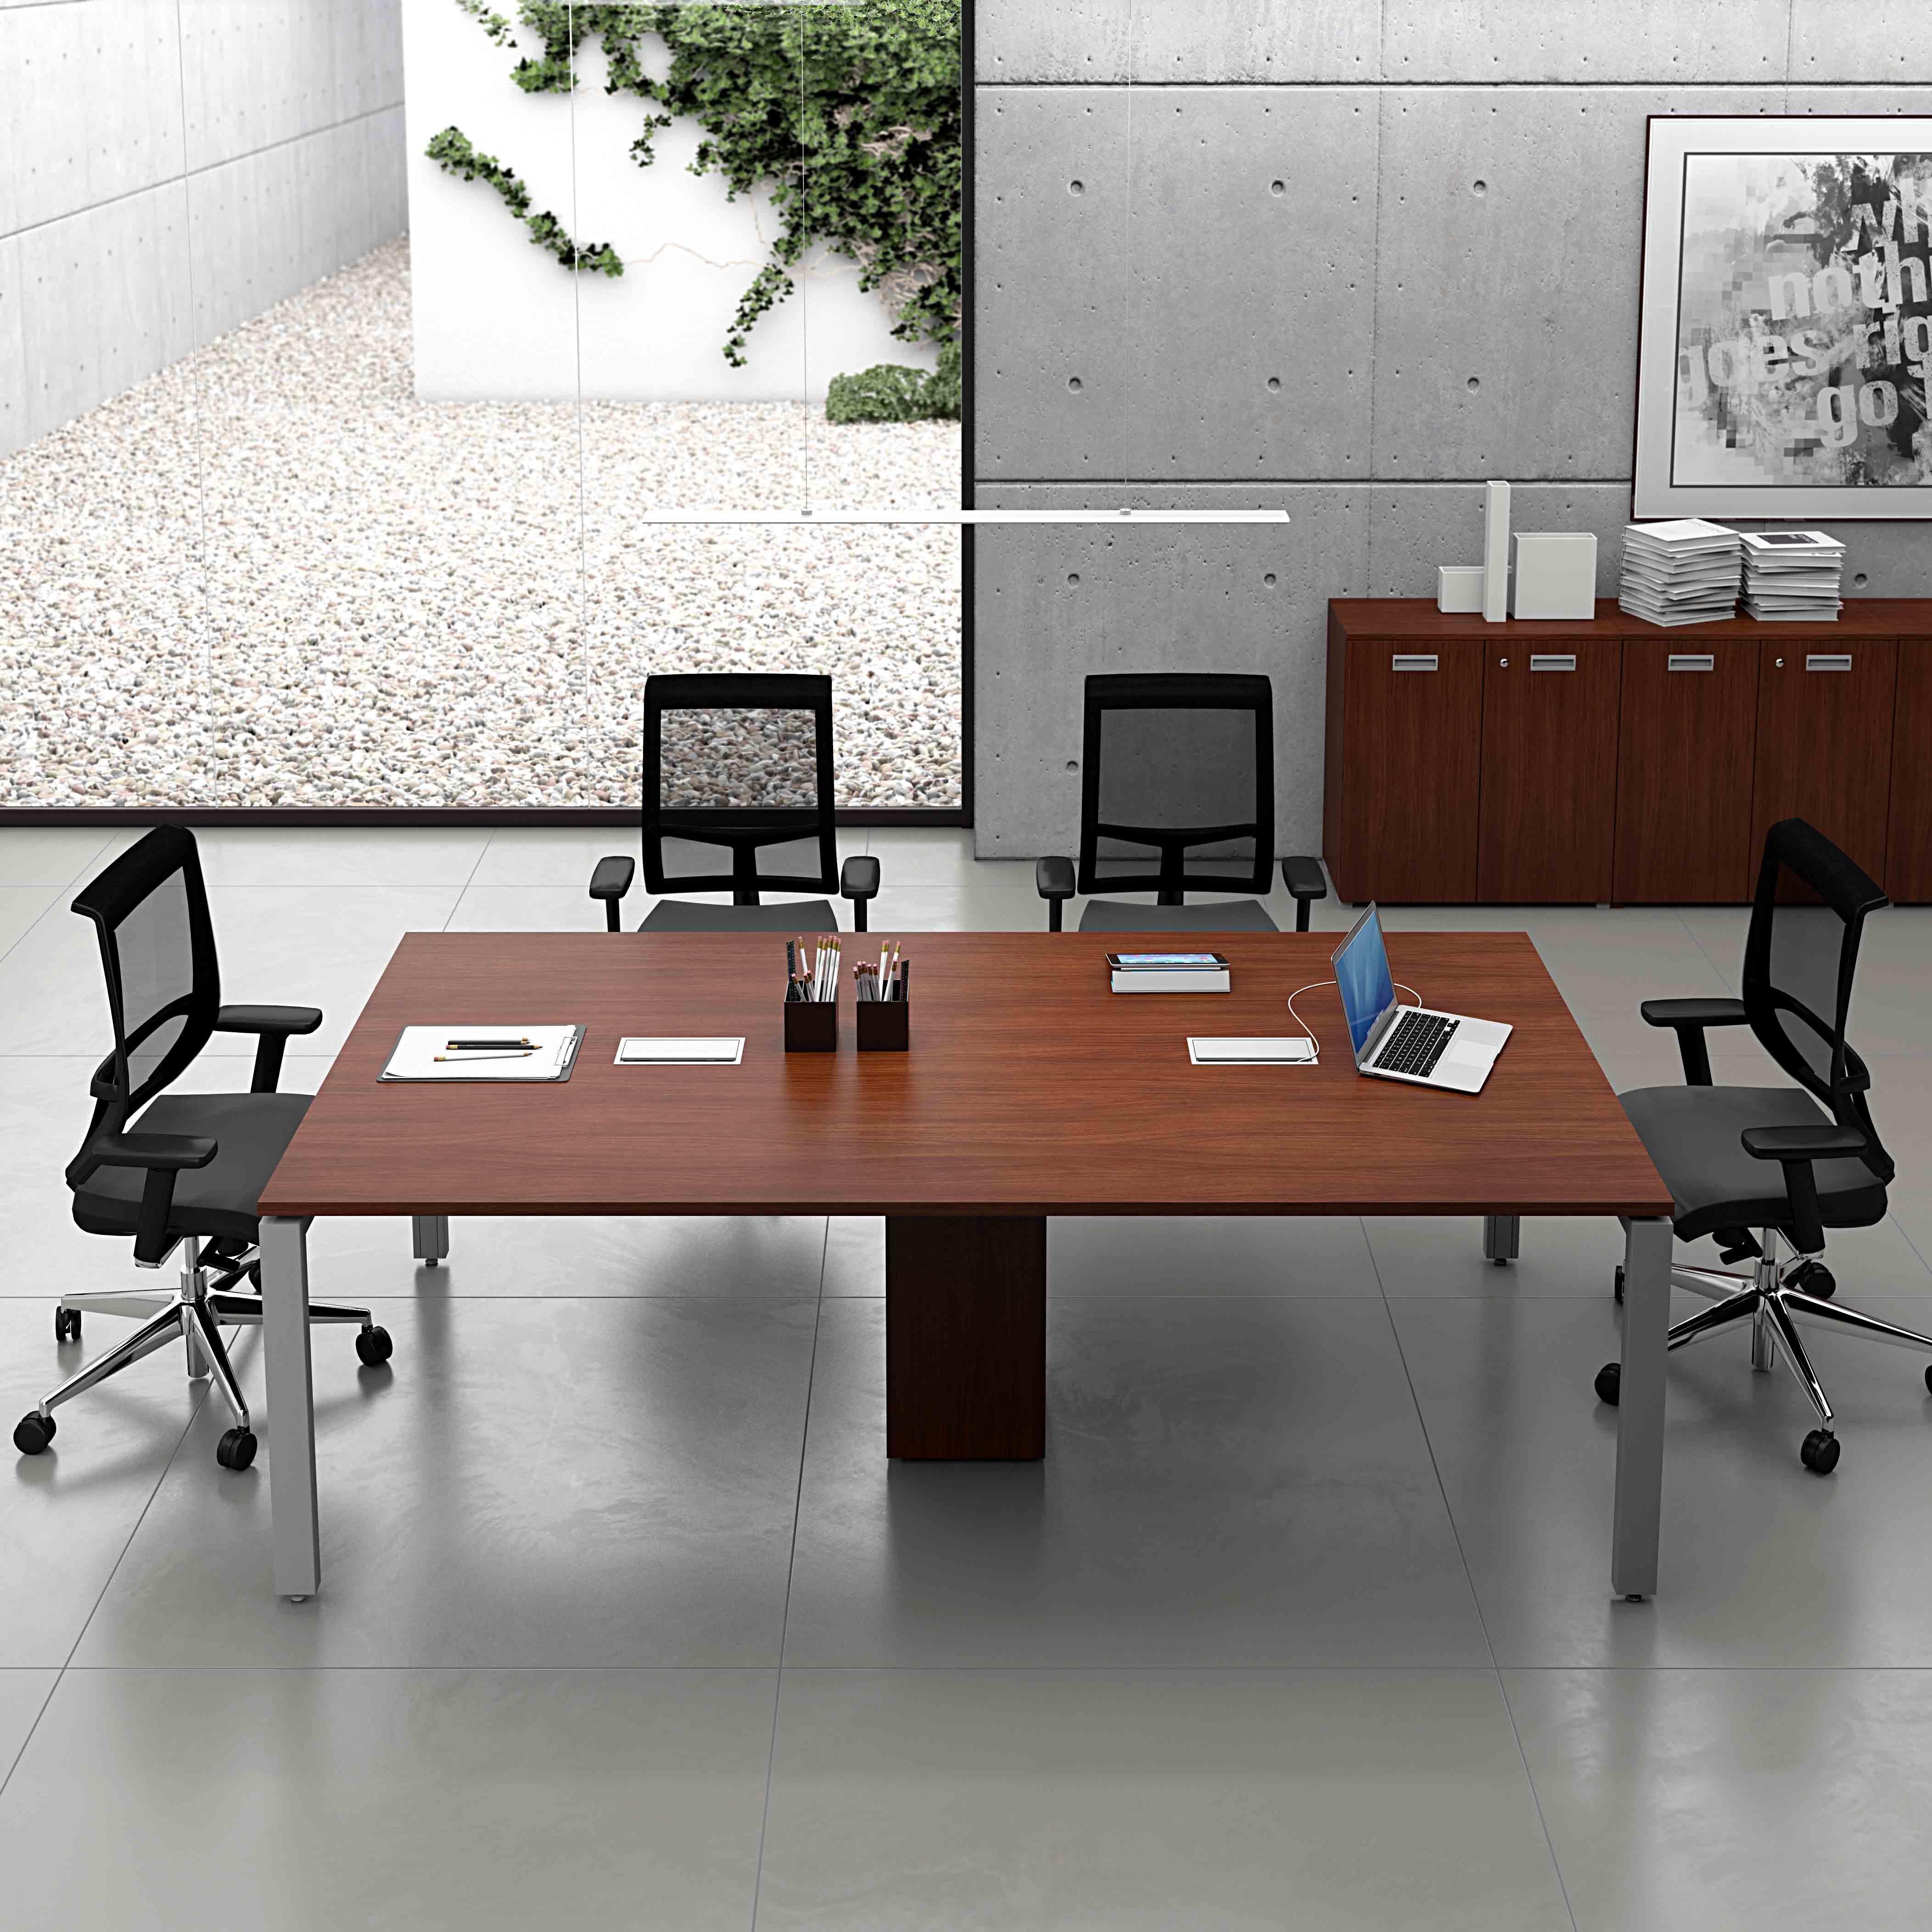 INFINITY MEETING TABLE